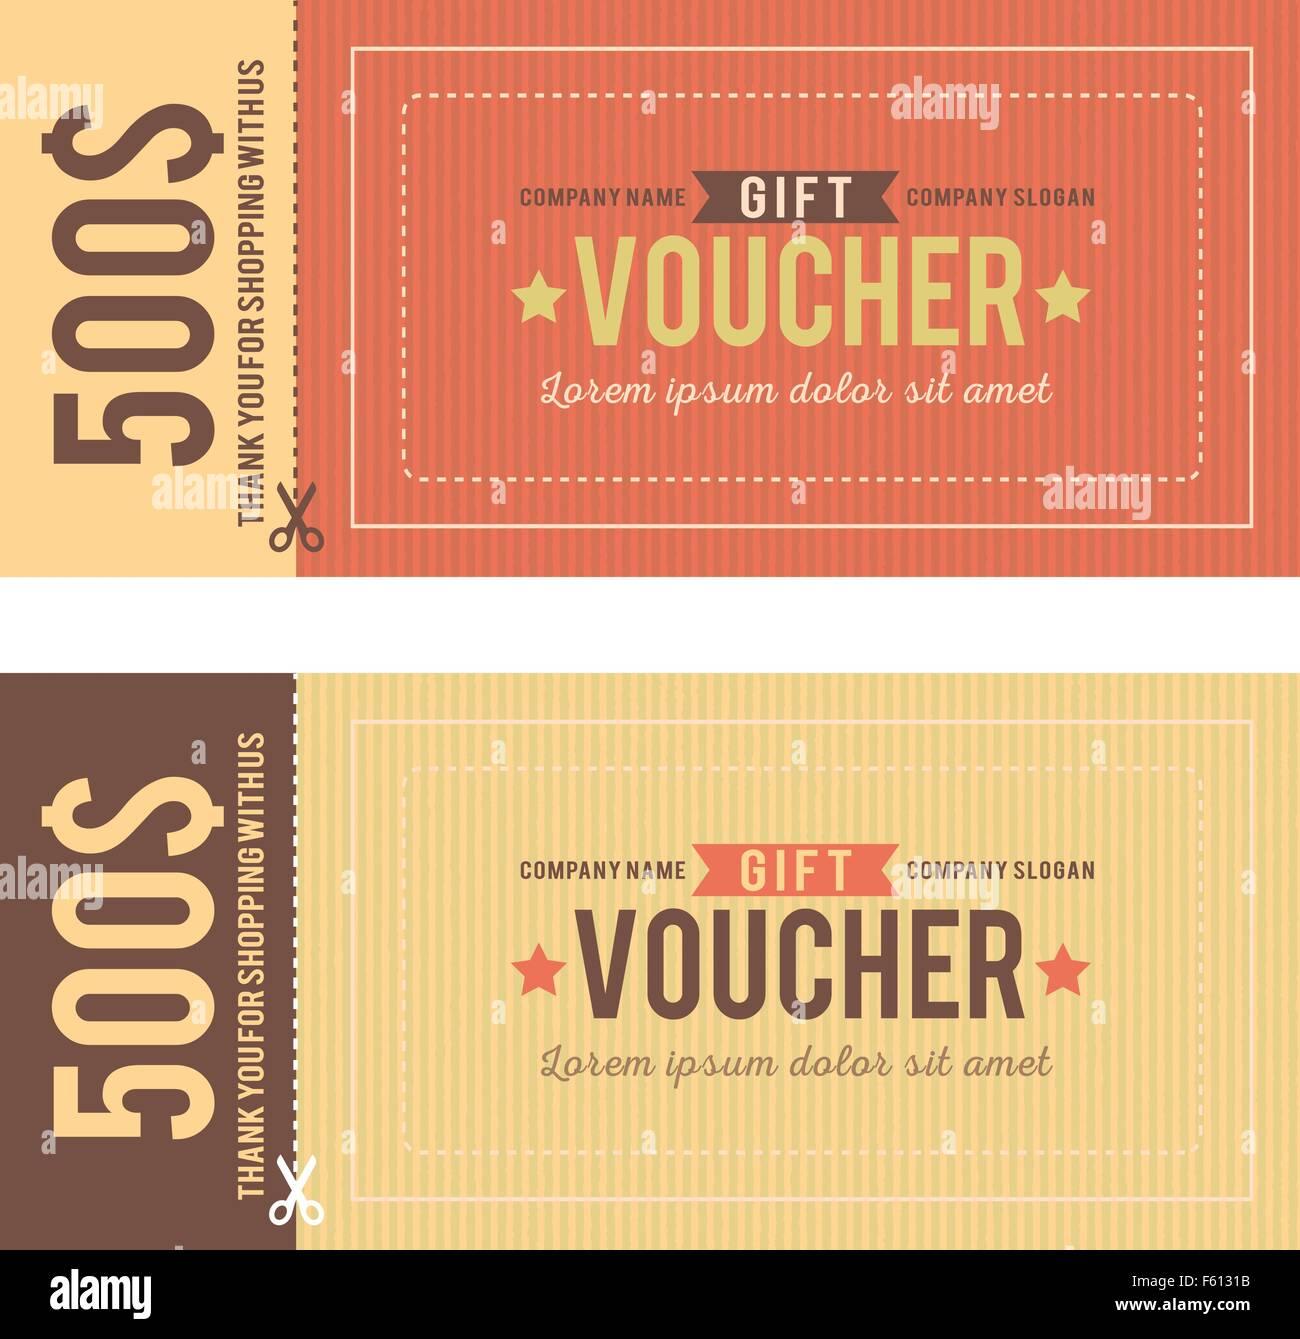 Vintage Gift Voucher Vector Template  Gift Voucher Format